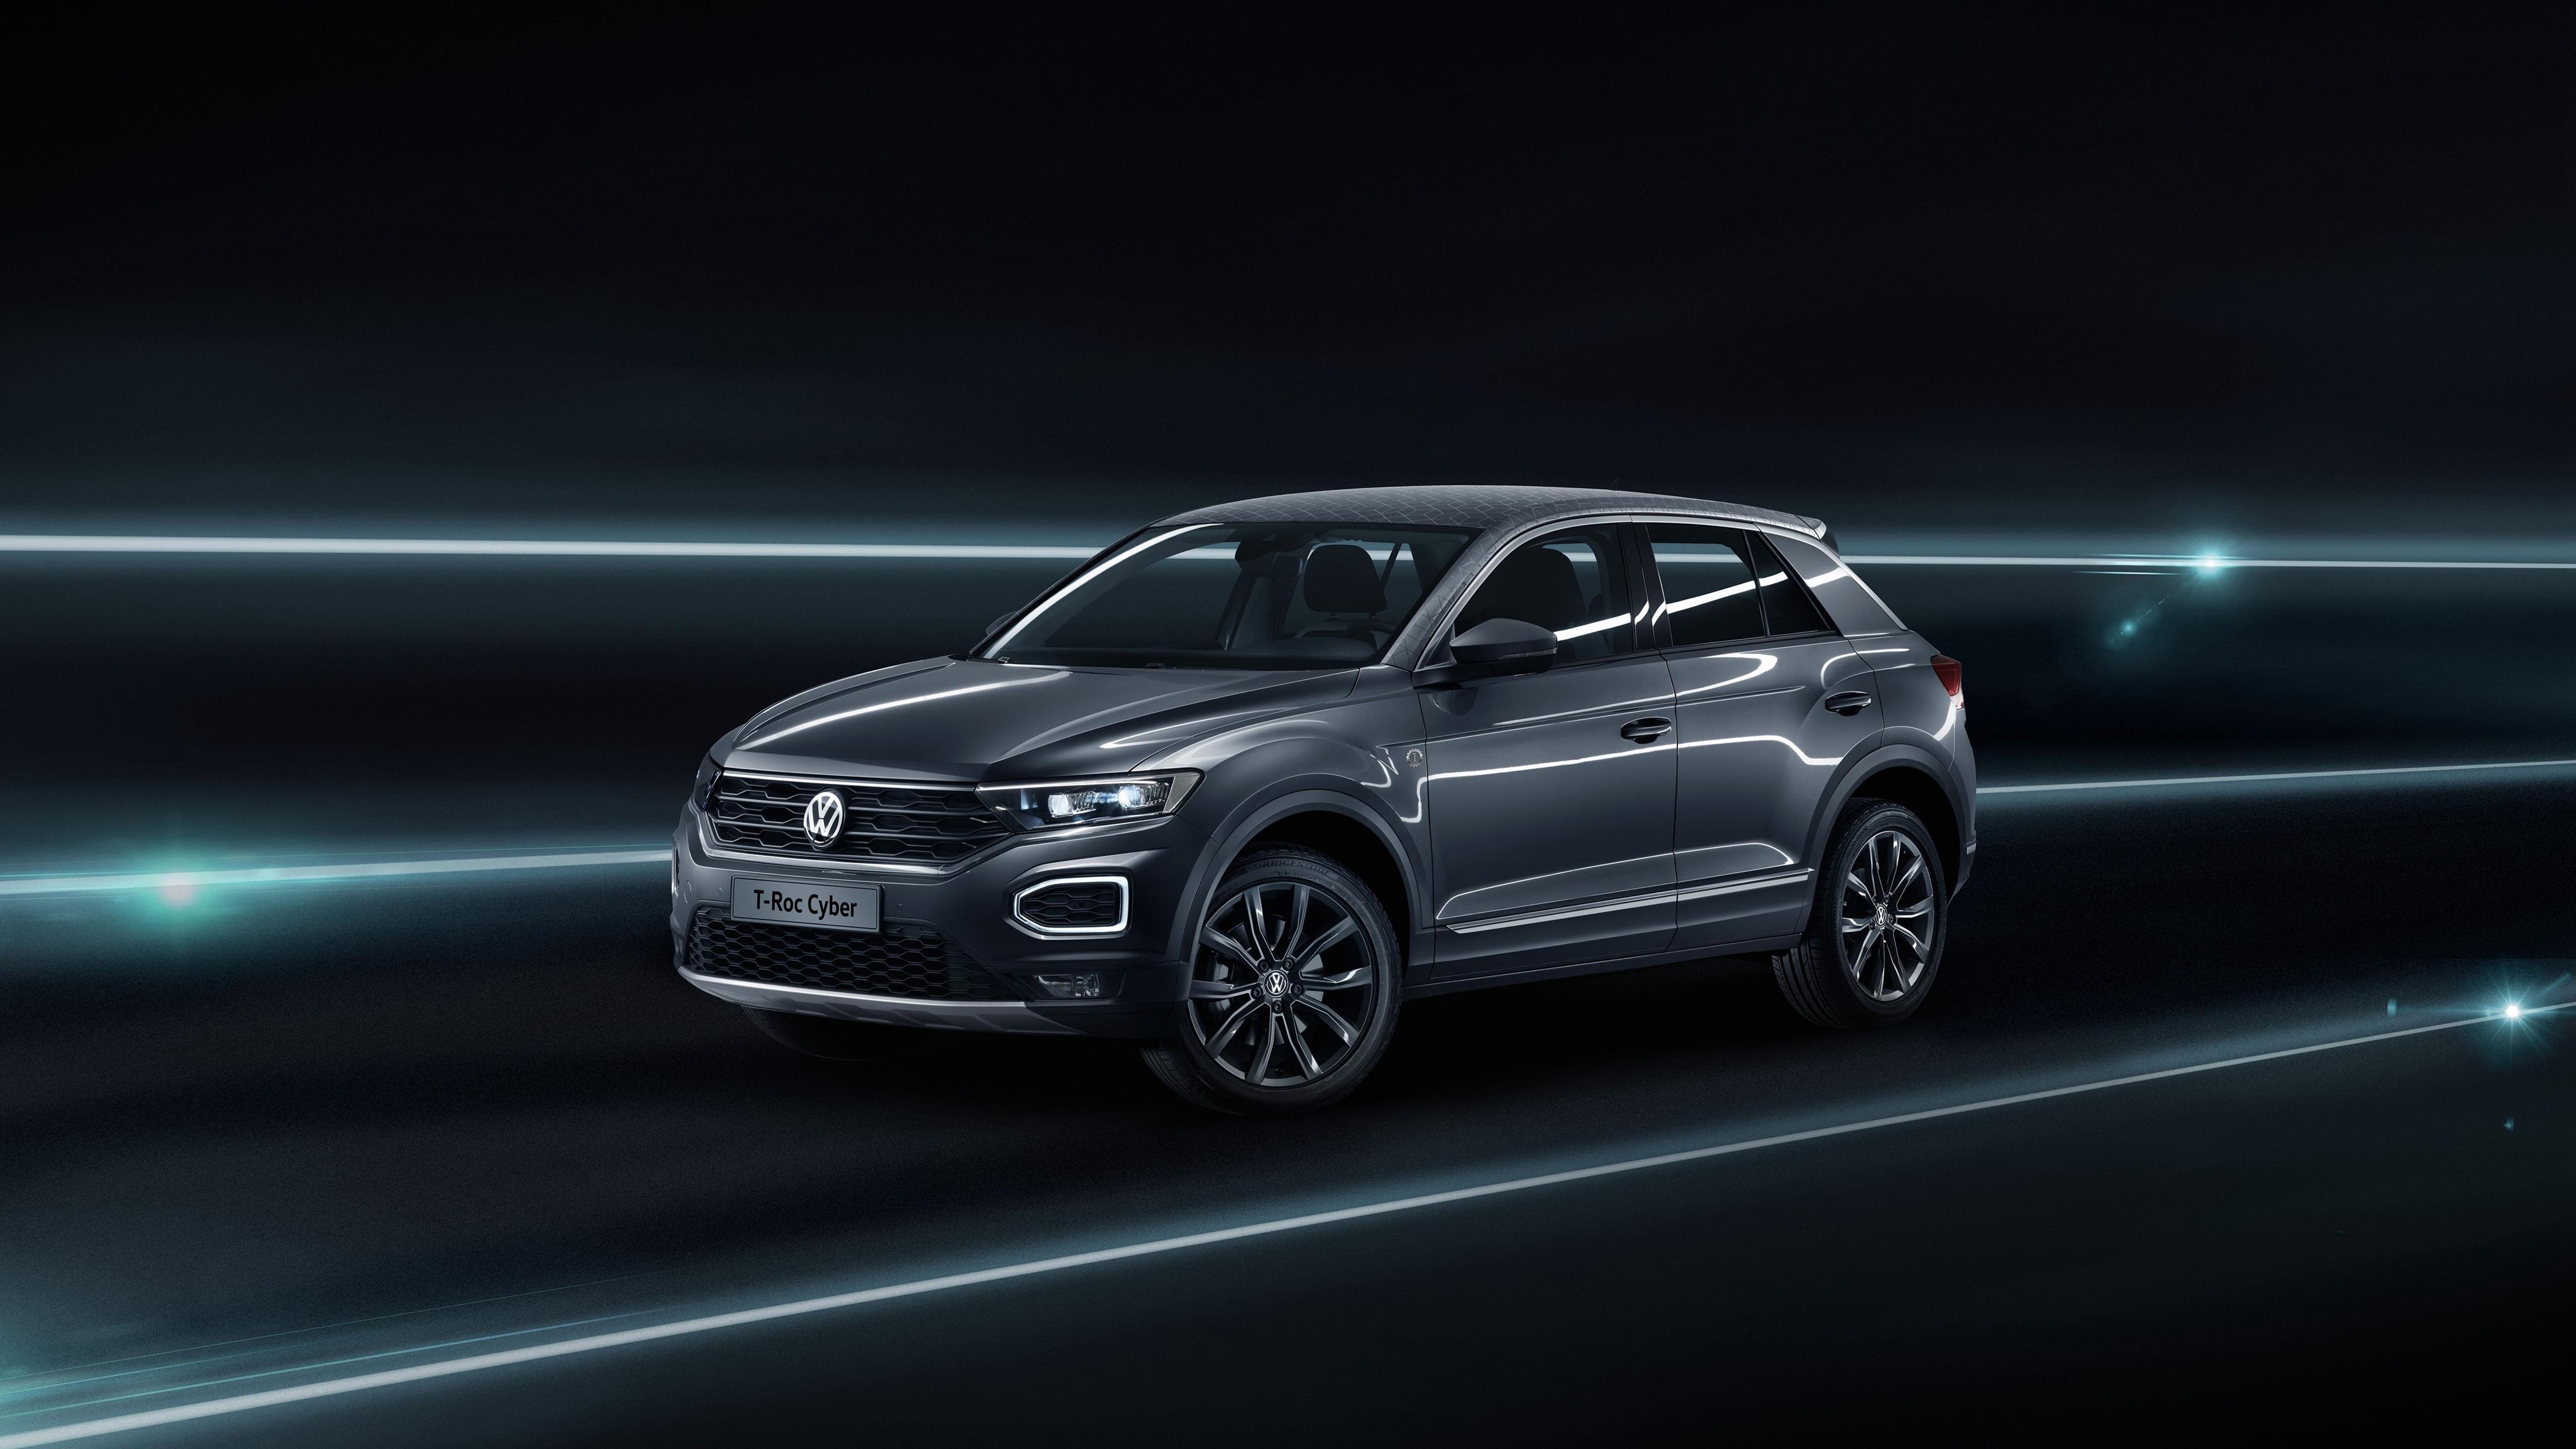 HDoboi.Kiev.ua - Volkswagen T Roc Cyber Special Edition, 4к обои для телефона автомобили